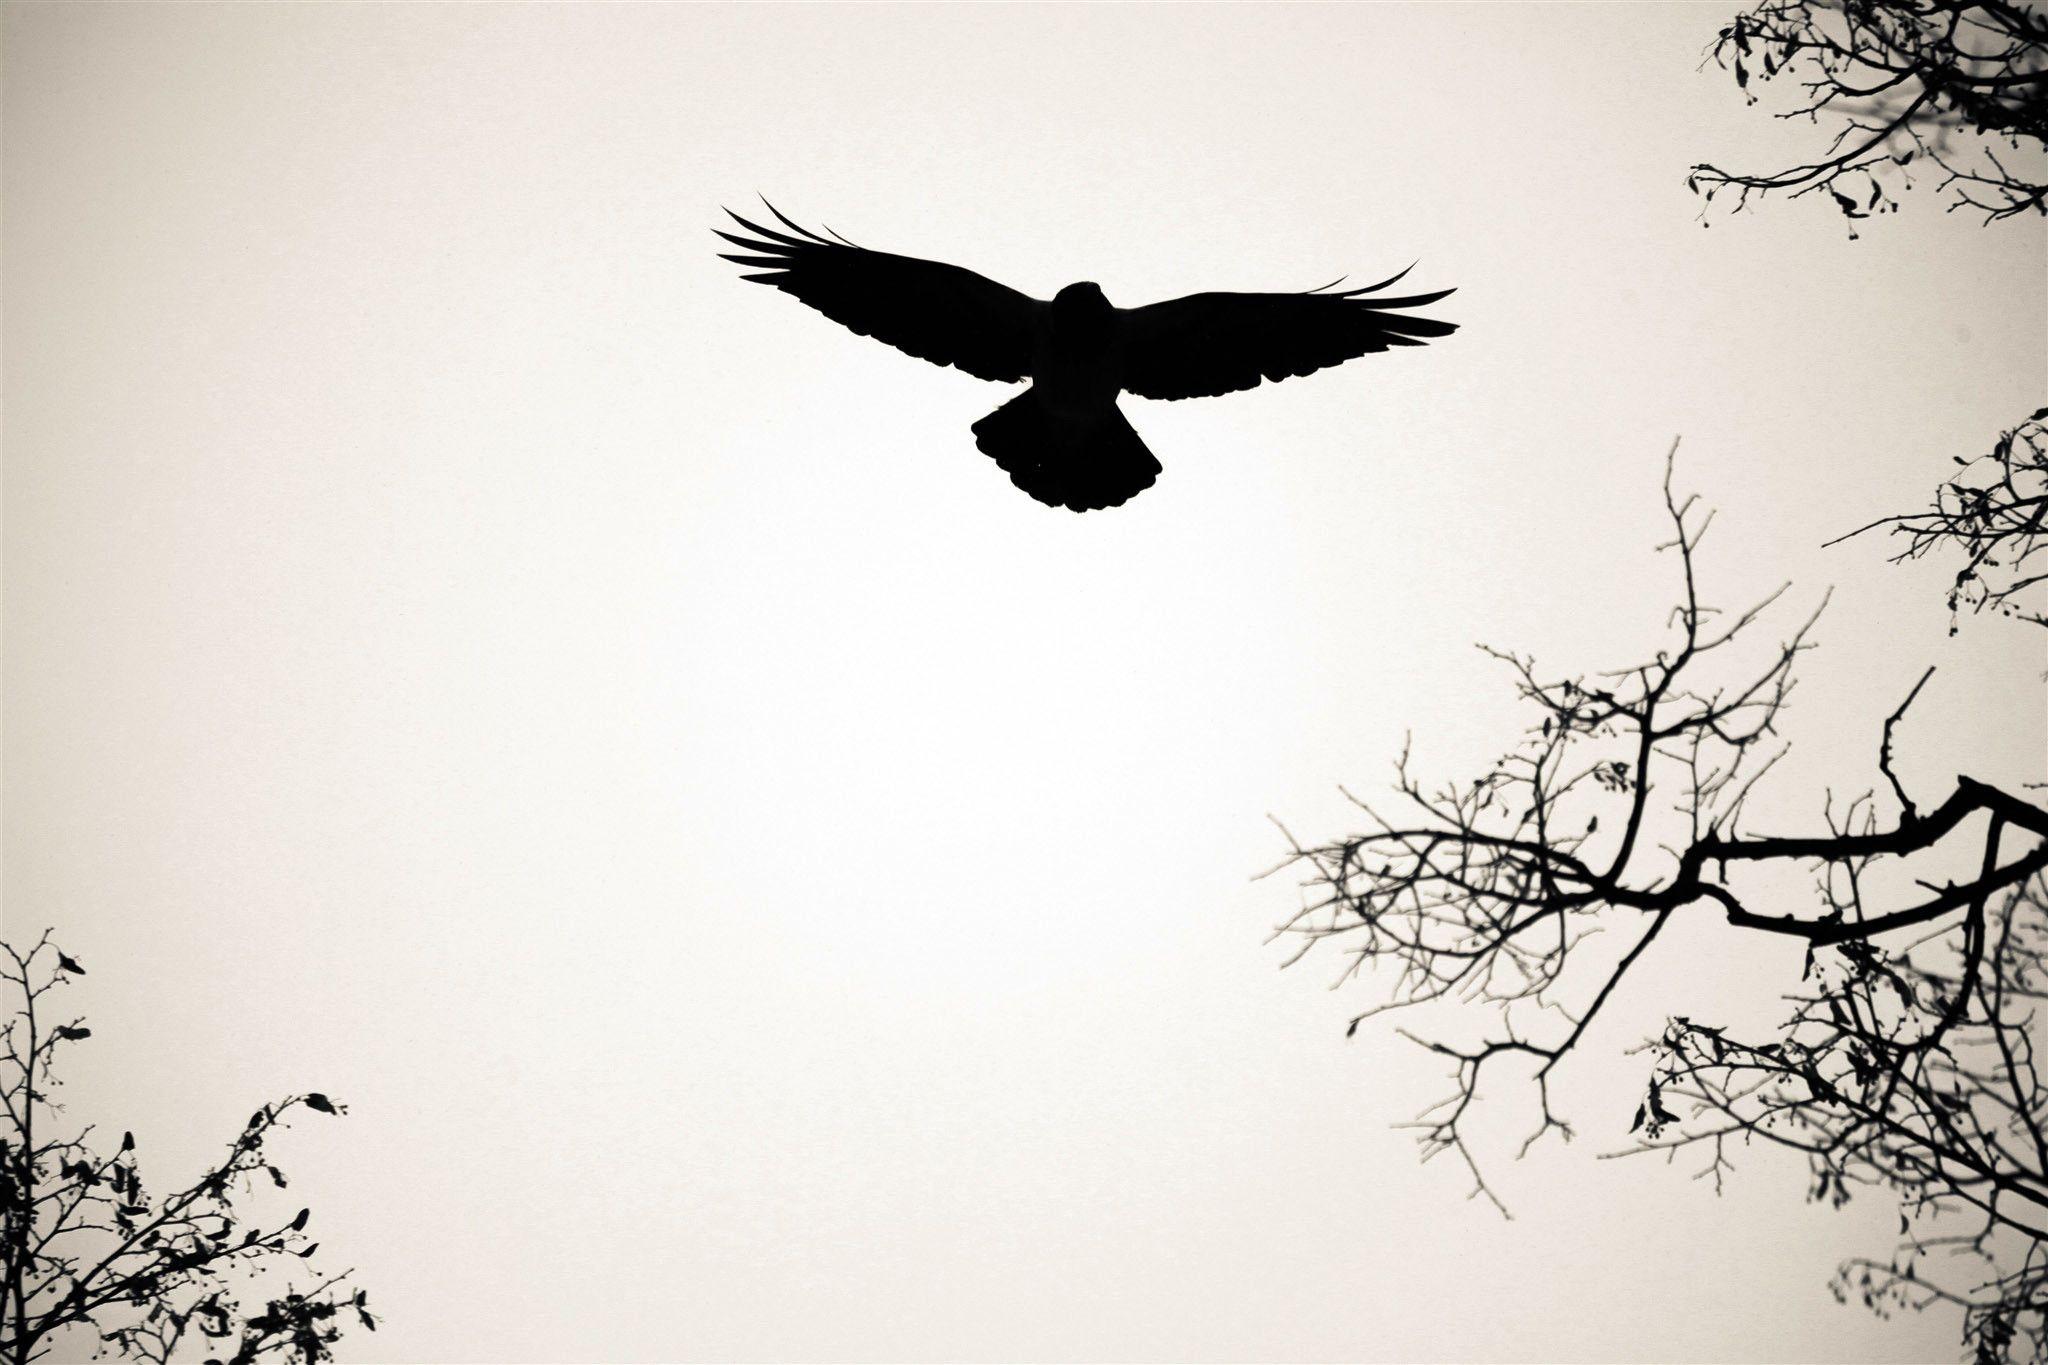 bird silhouette wallpaper wallpapersafari